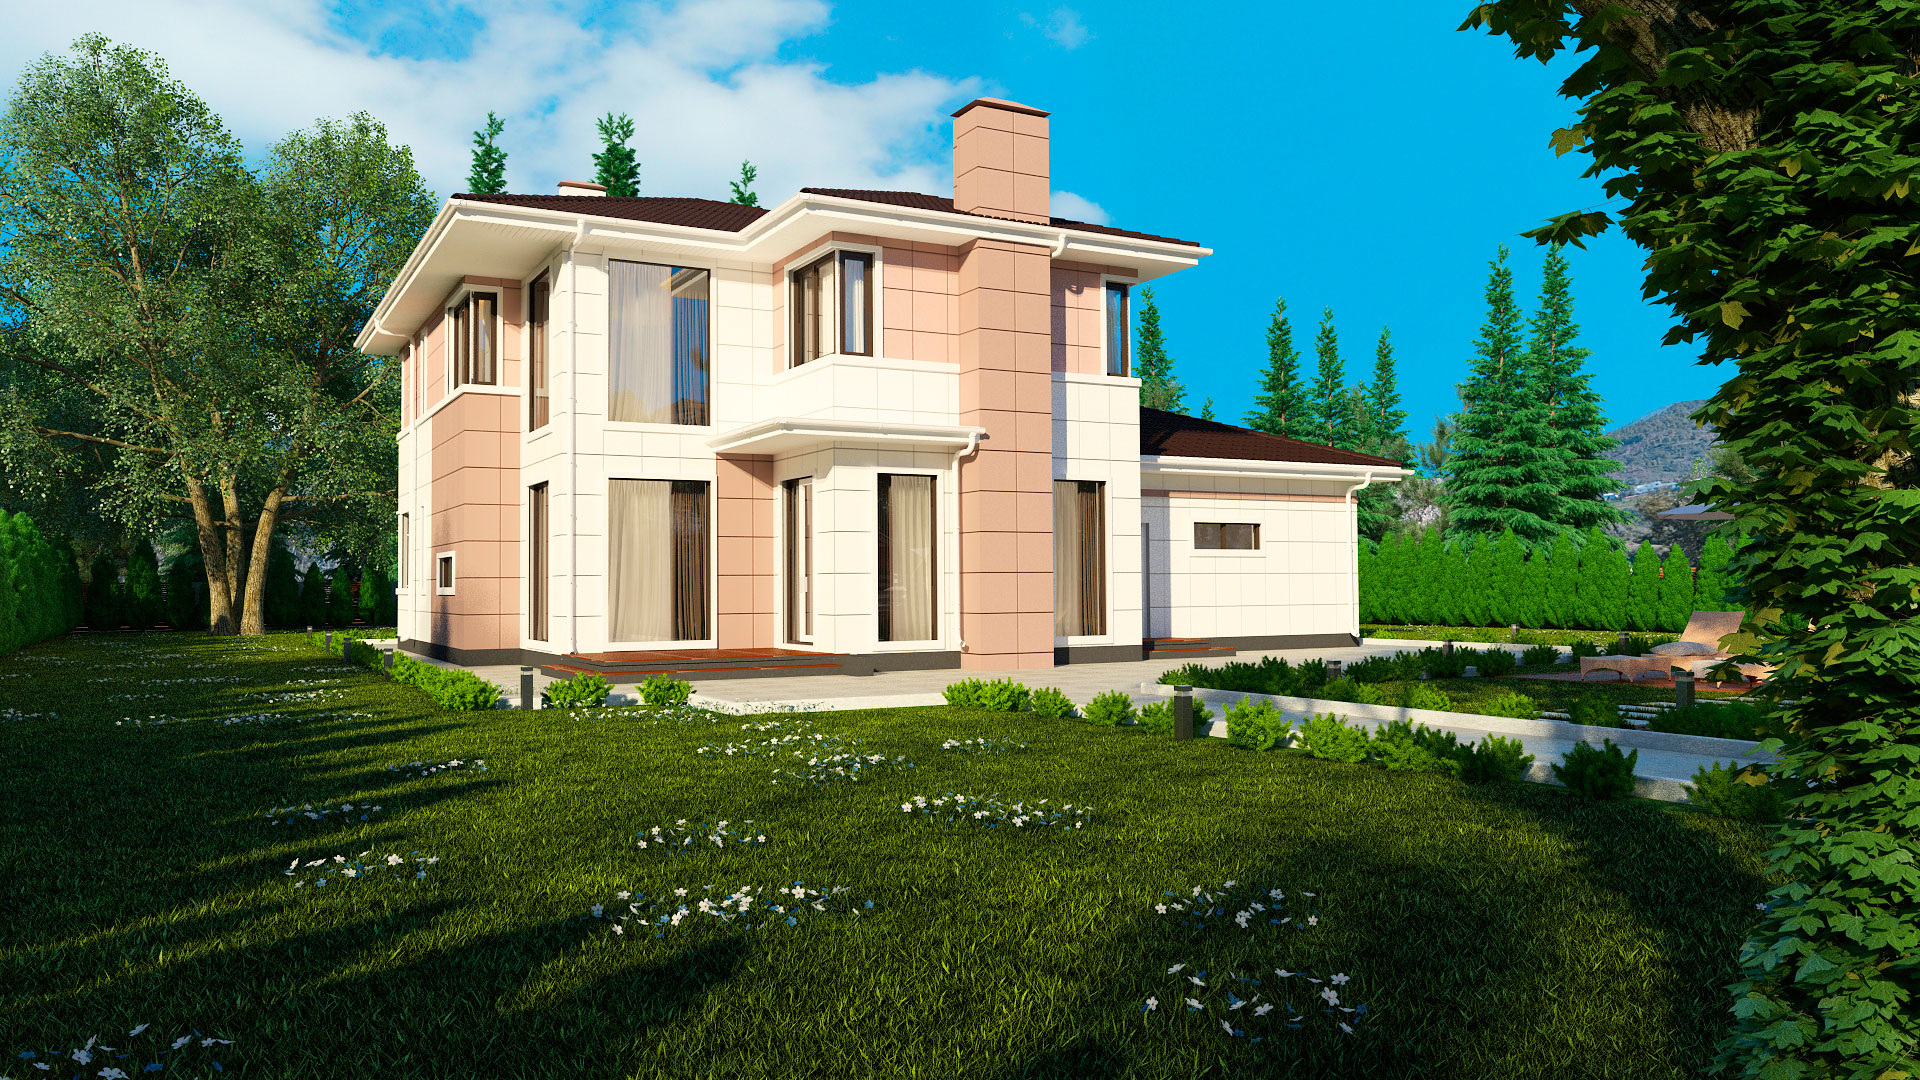 Задний фасад двухэтажного дома БЭНПАН, проект МС-239.